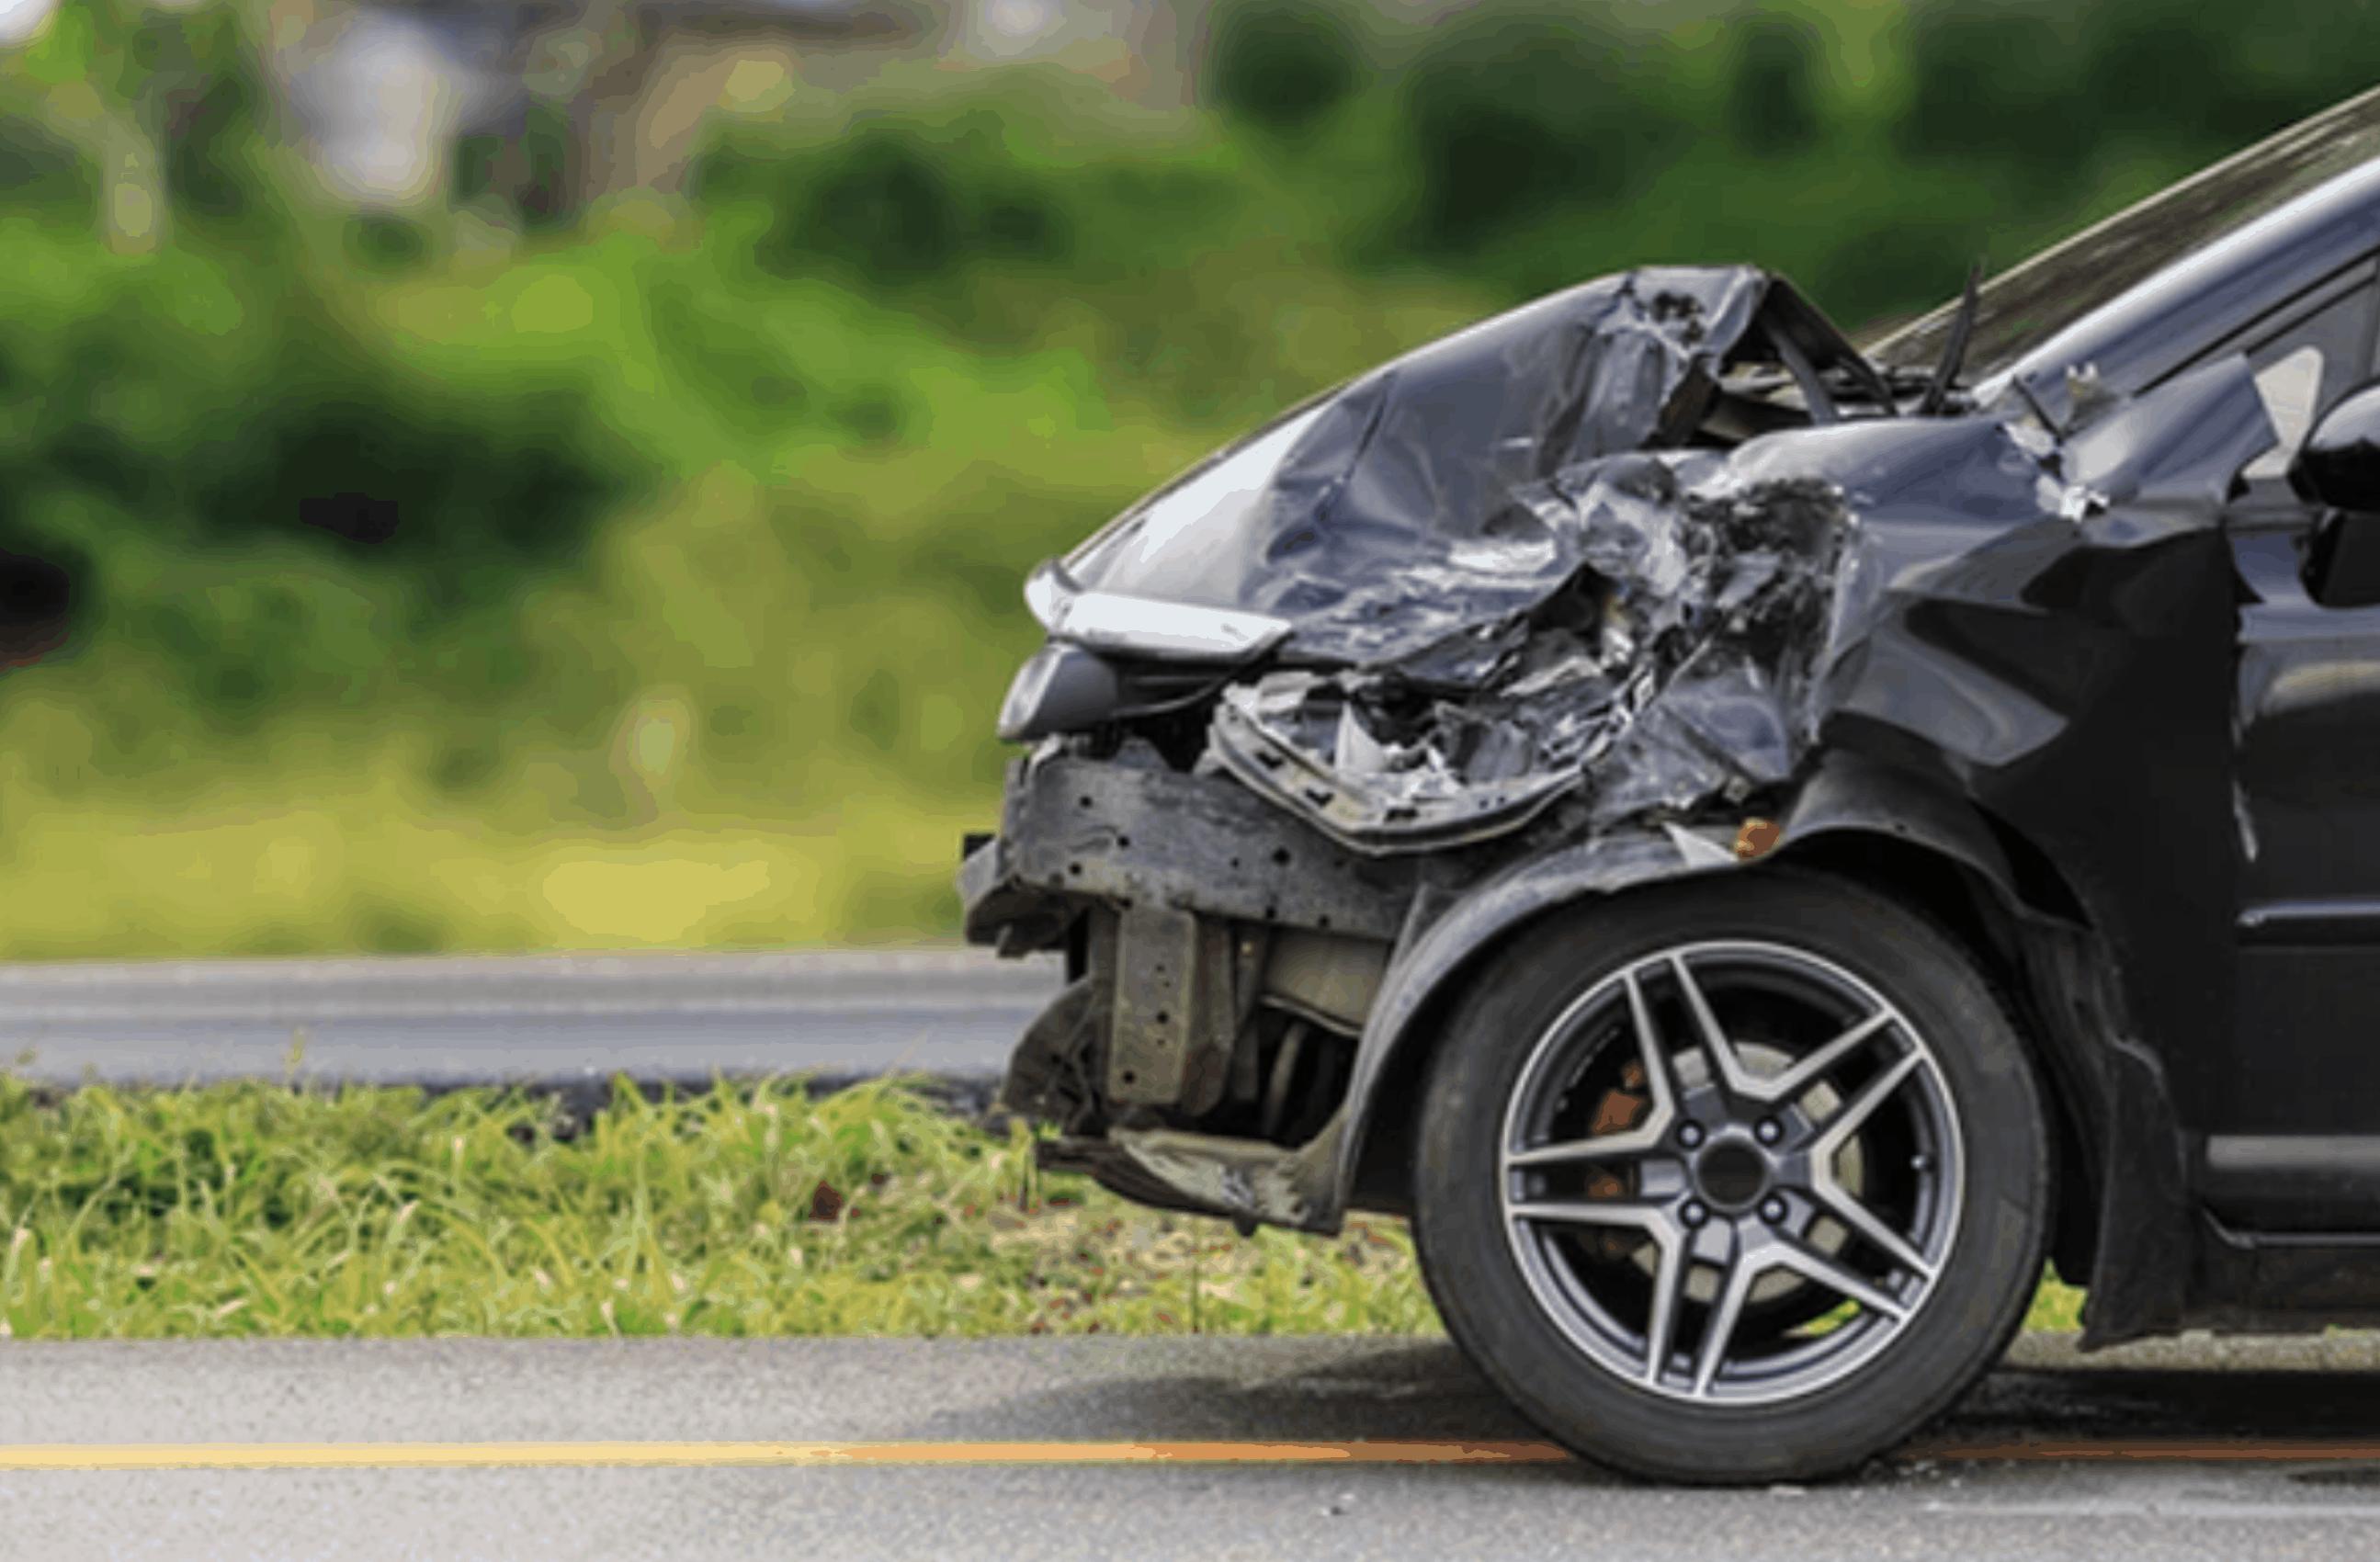 santa ana car insurance companies and car accident attorneys razavi law group